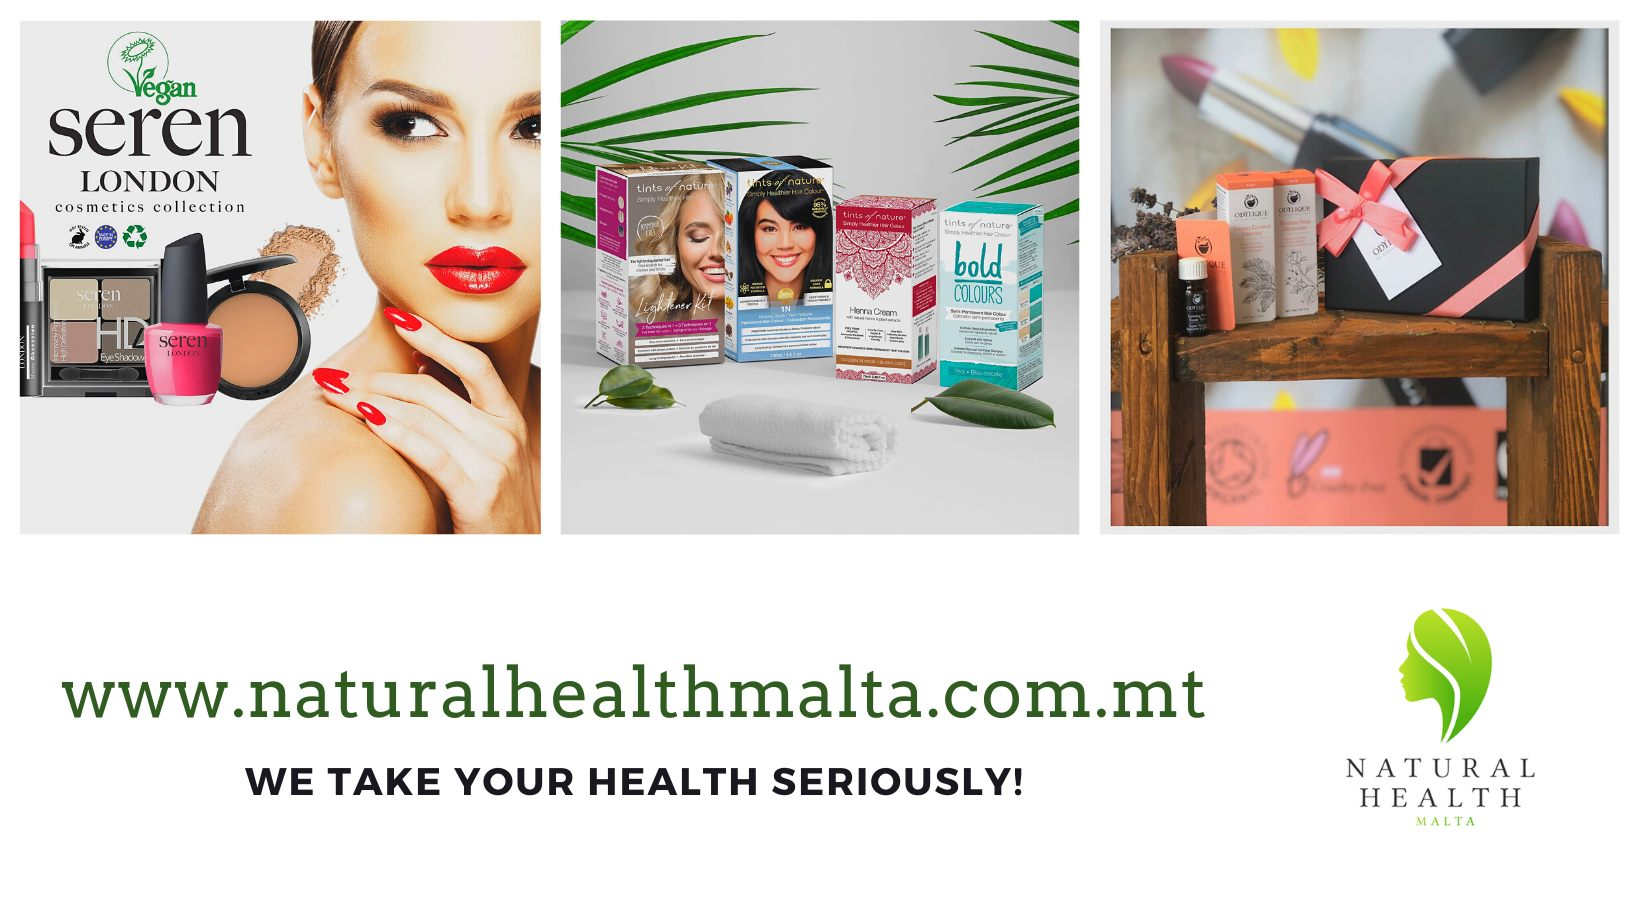 Natural Health Malta